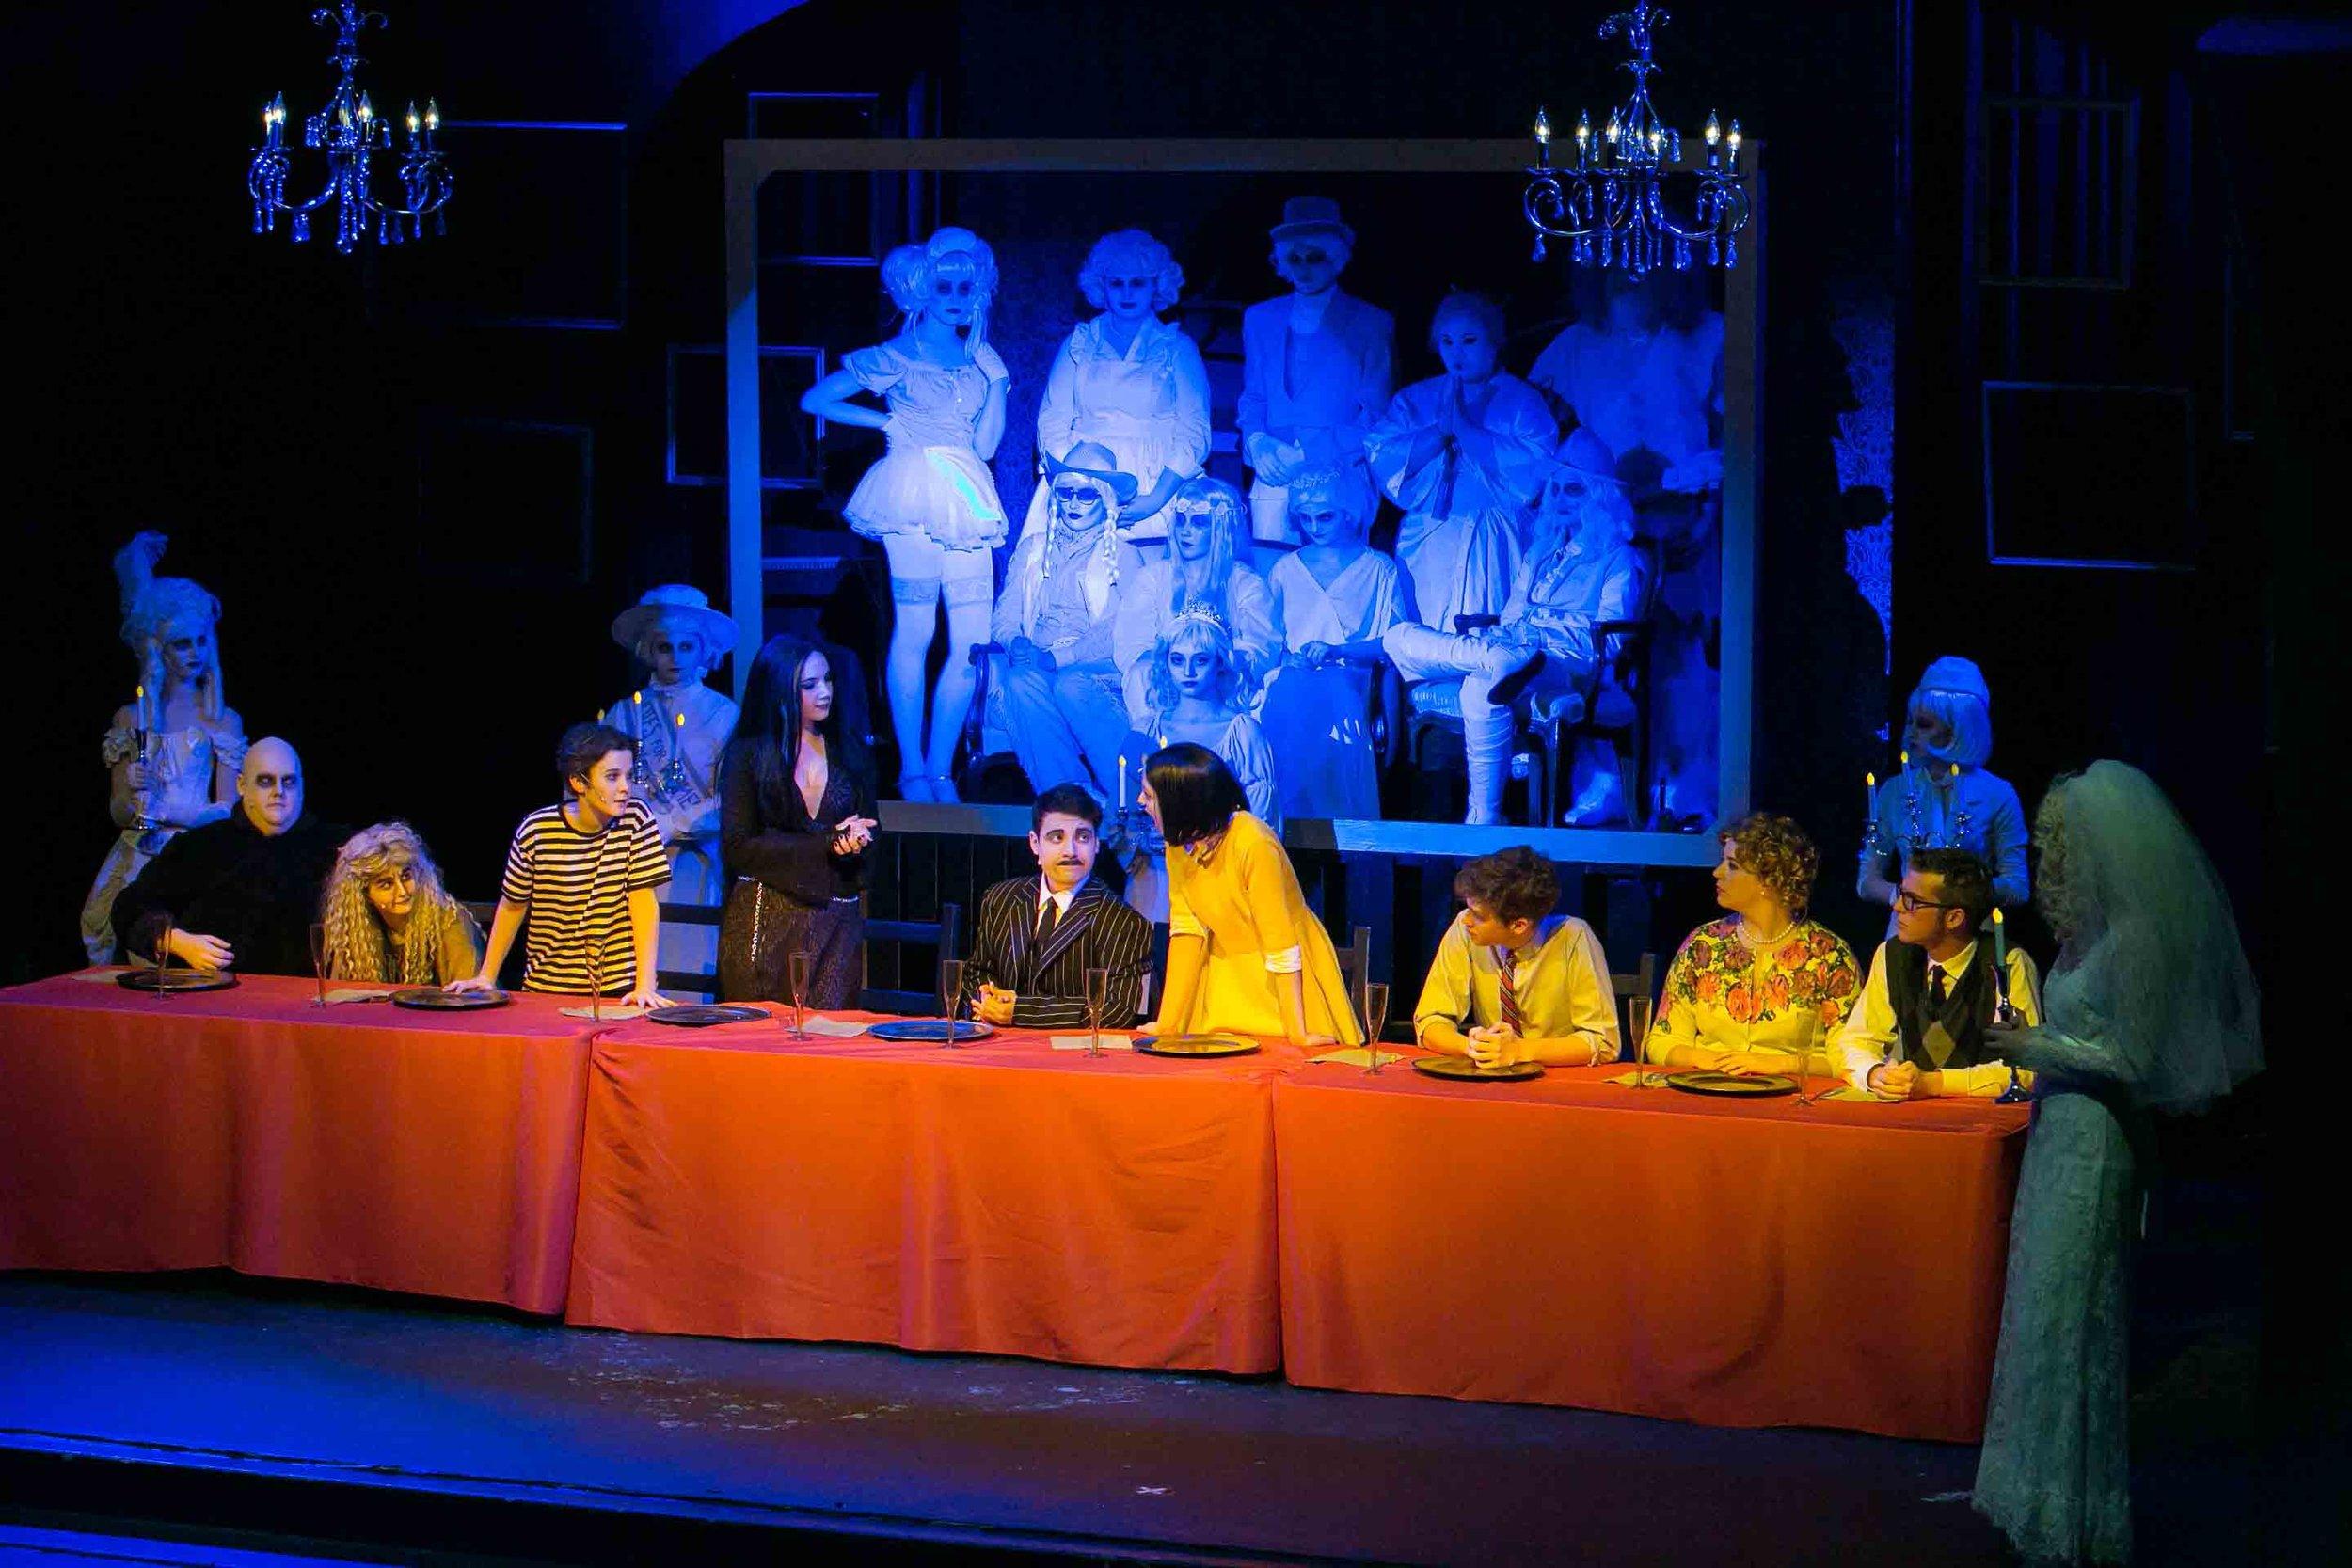 6-19-16 Addams Family Creepy Cast 0181.jpg